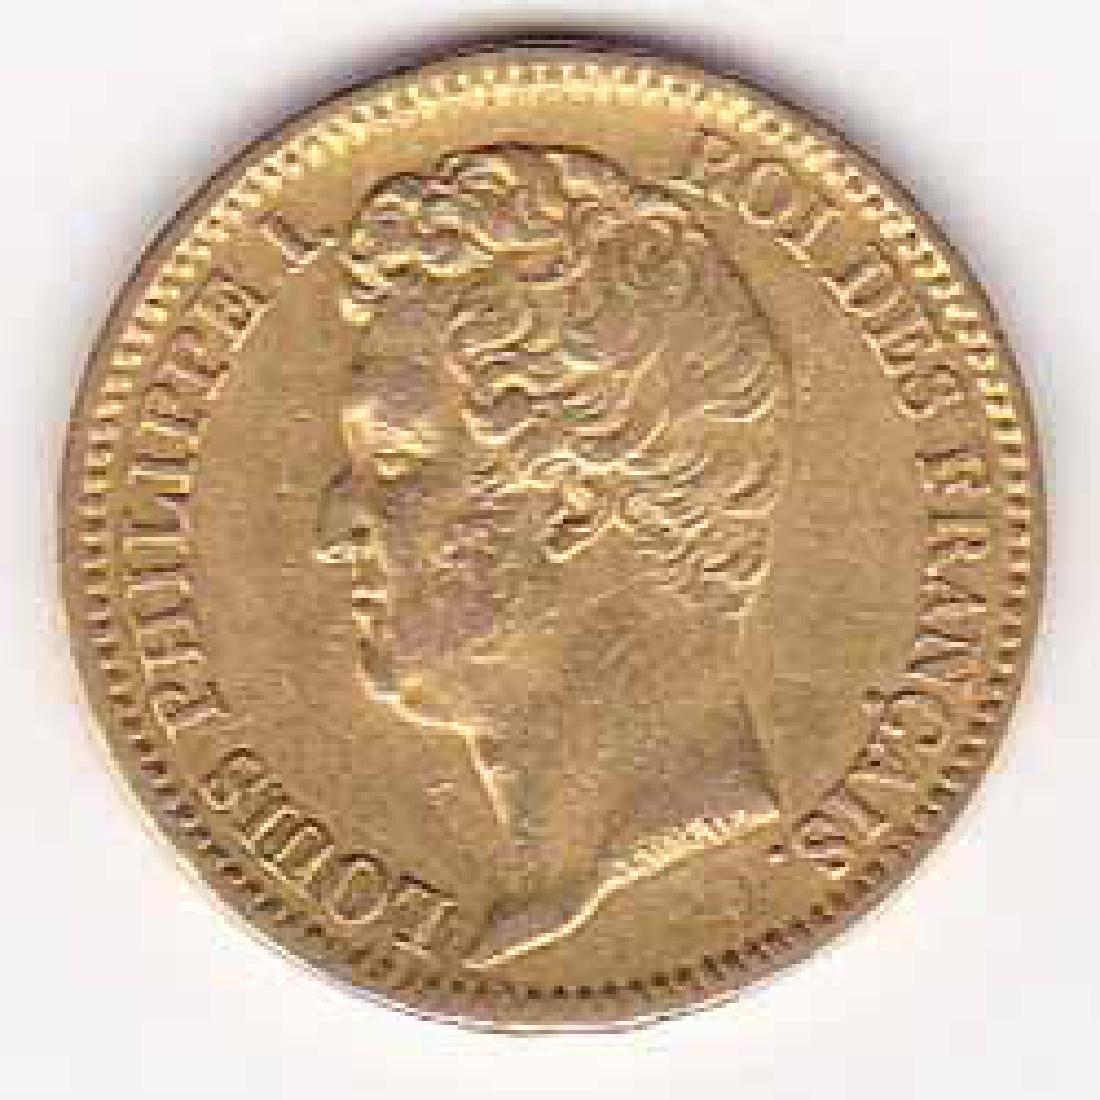 France 20 francs gold 1830-31 Philippe I